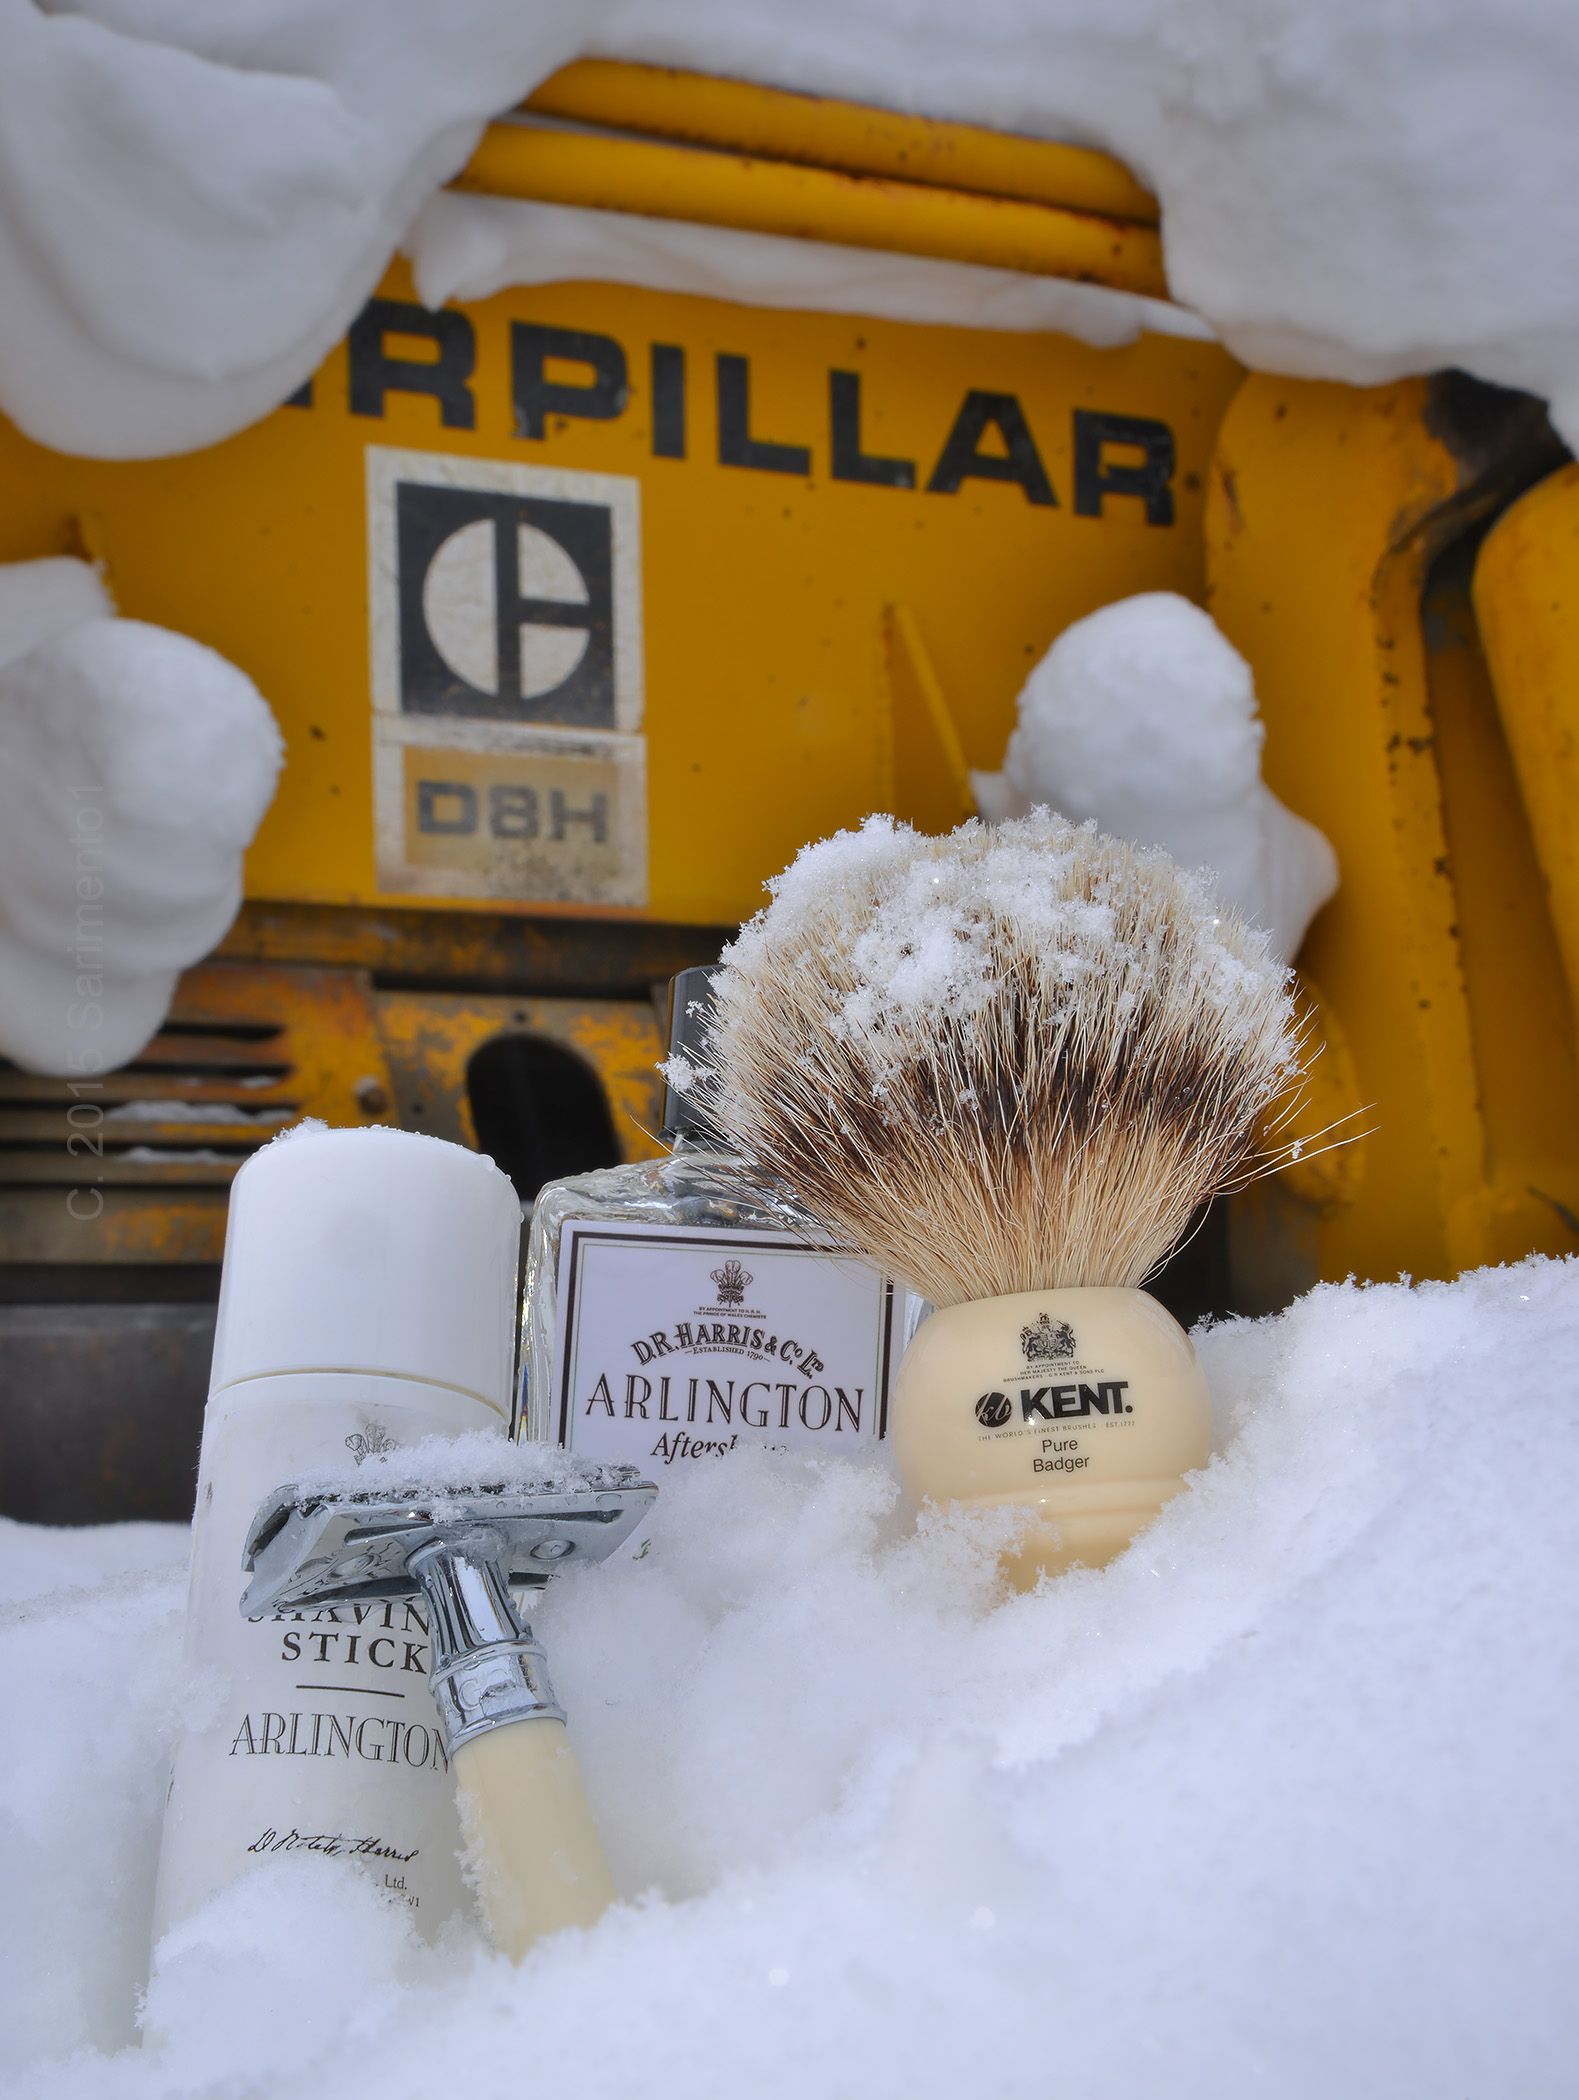 D.R. Harris Arlington shave stick and aftershave, Edwin Jagger safety razor, Kent badger brush, Alaska, March 6, 2015